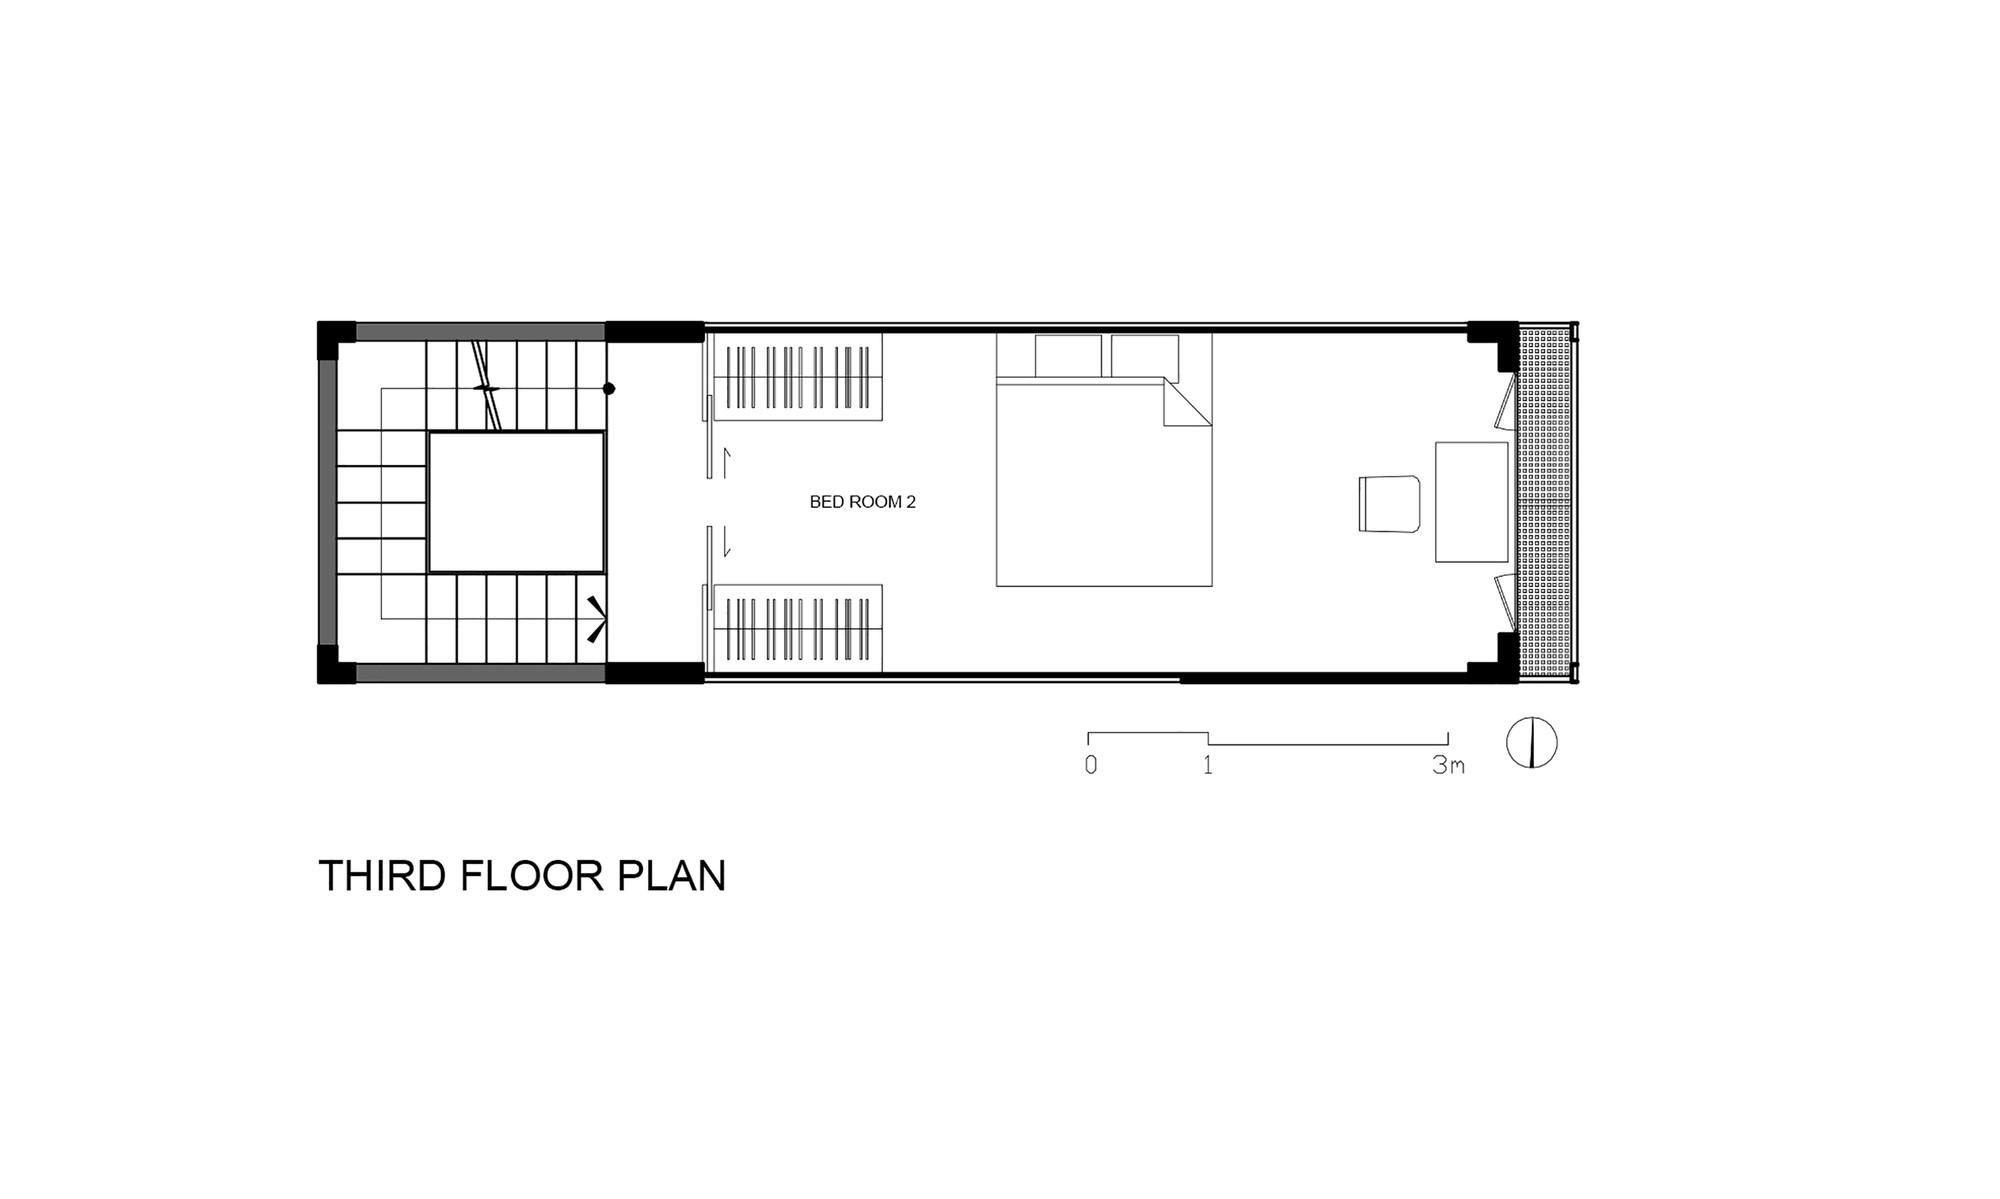 planos de casas 3x10